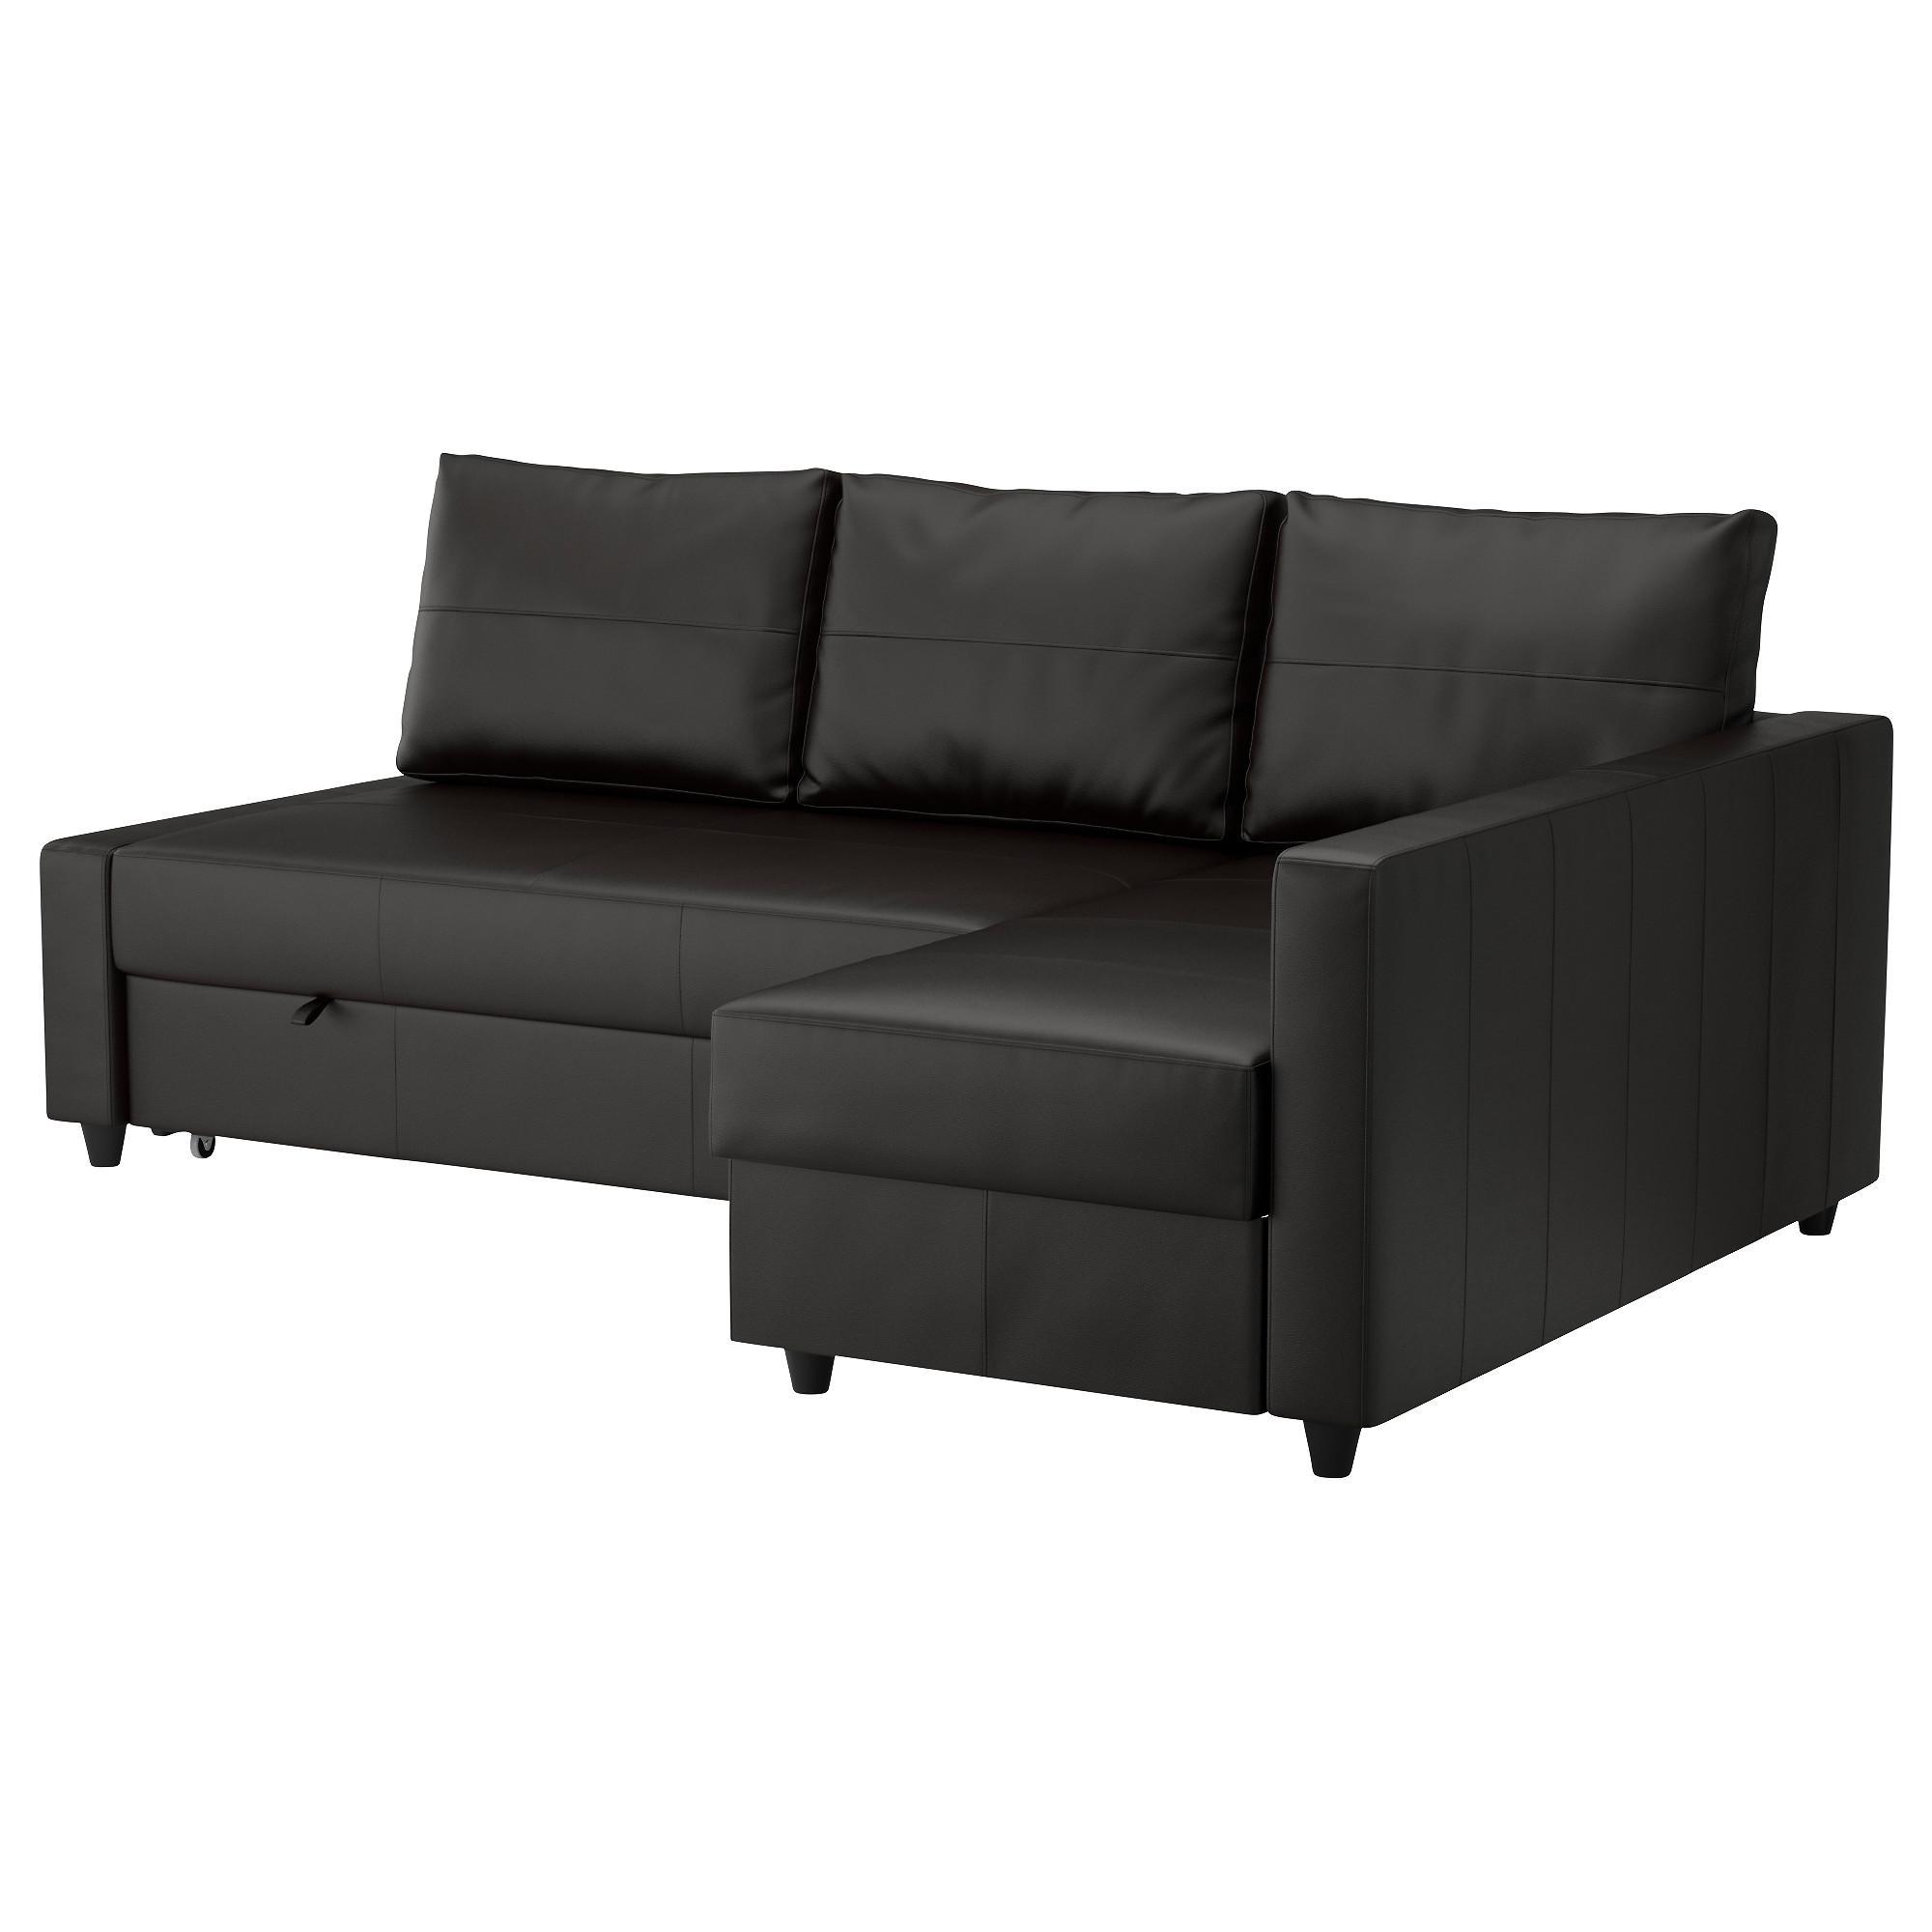 Friheten Corner Sofa Bed With Storage Bomstad Black – Ikea With Regard To Ikea Corner Sofa Bed With Storage (View 6 of 20)